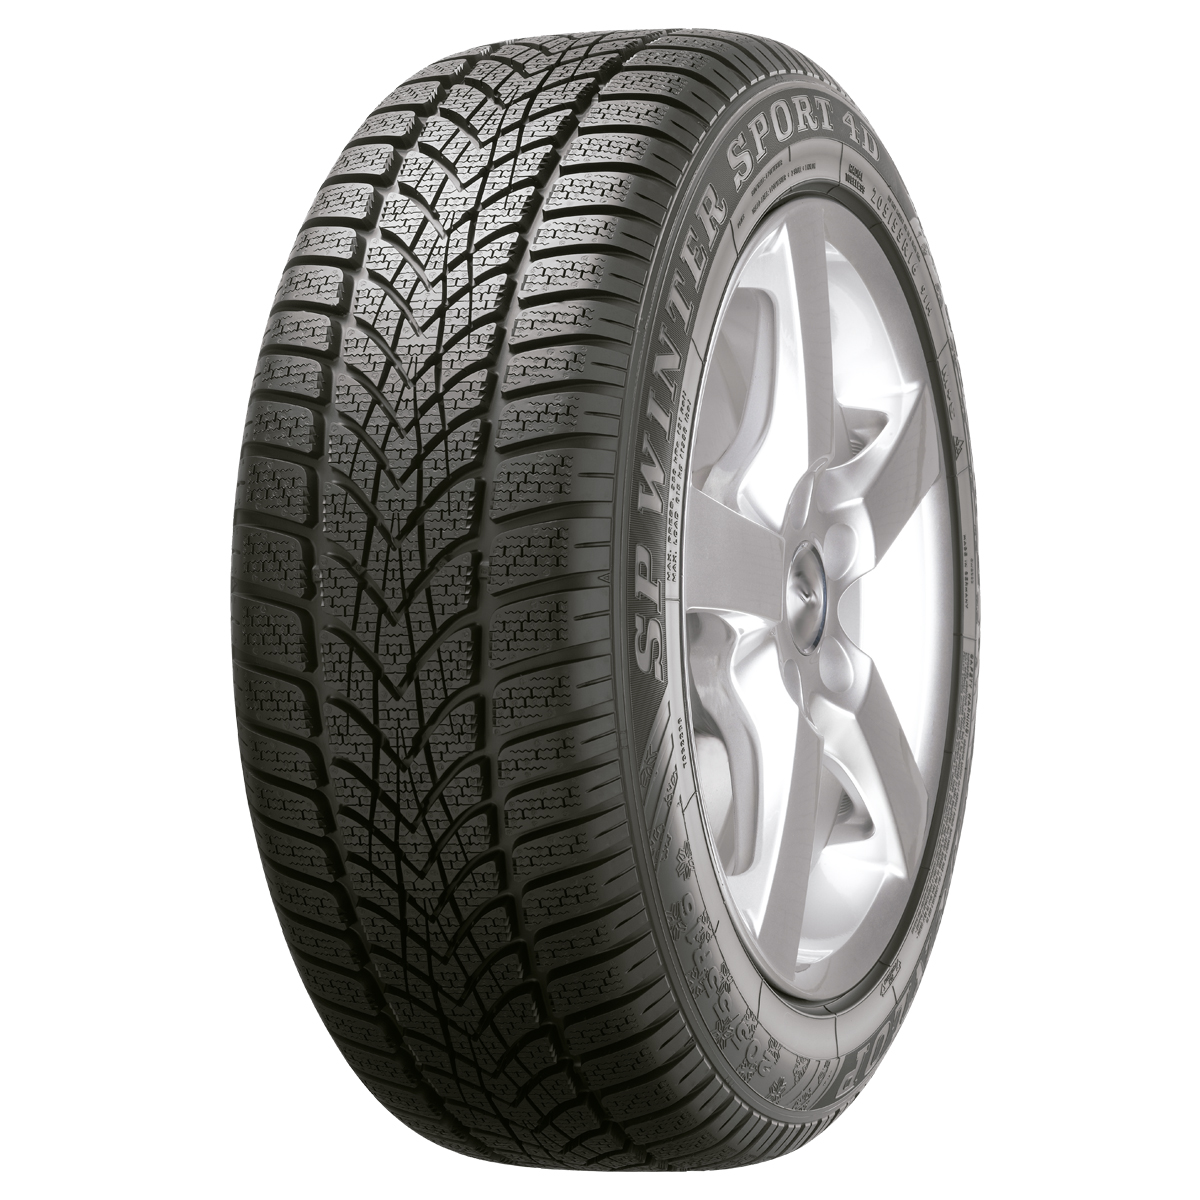 285/30R21 100W, Dunlop, Sport 4D MS